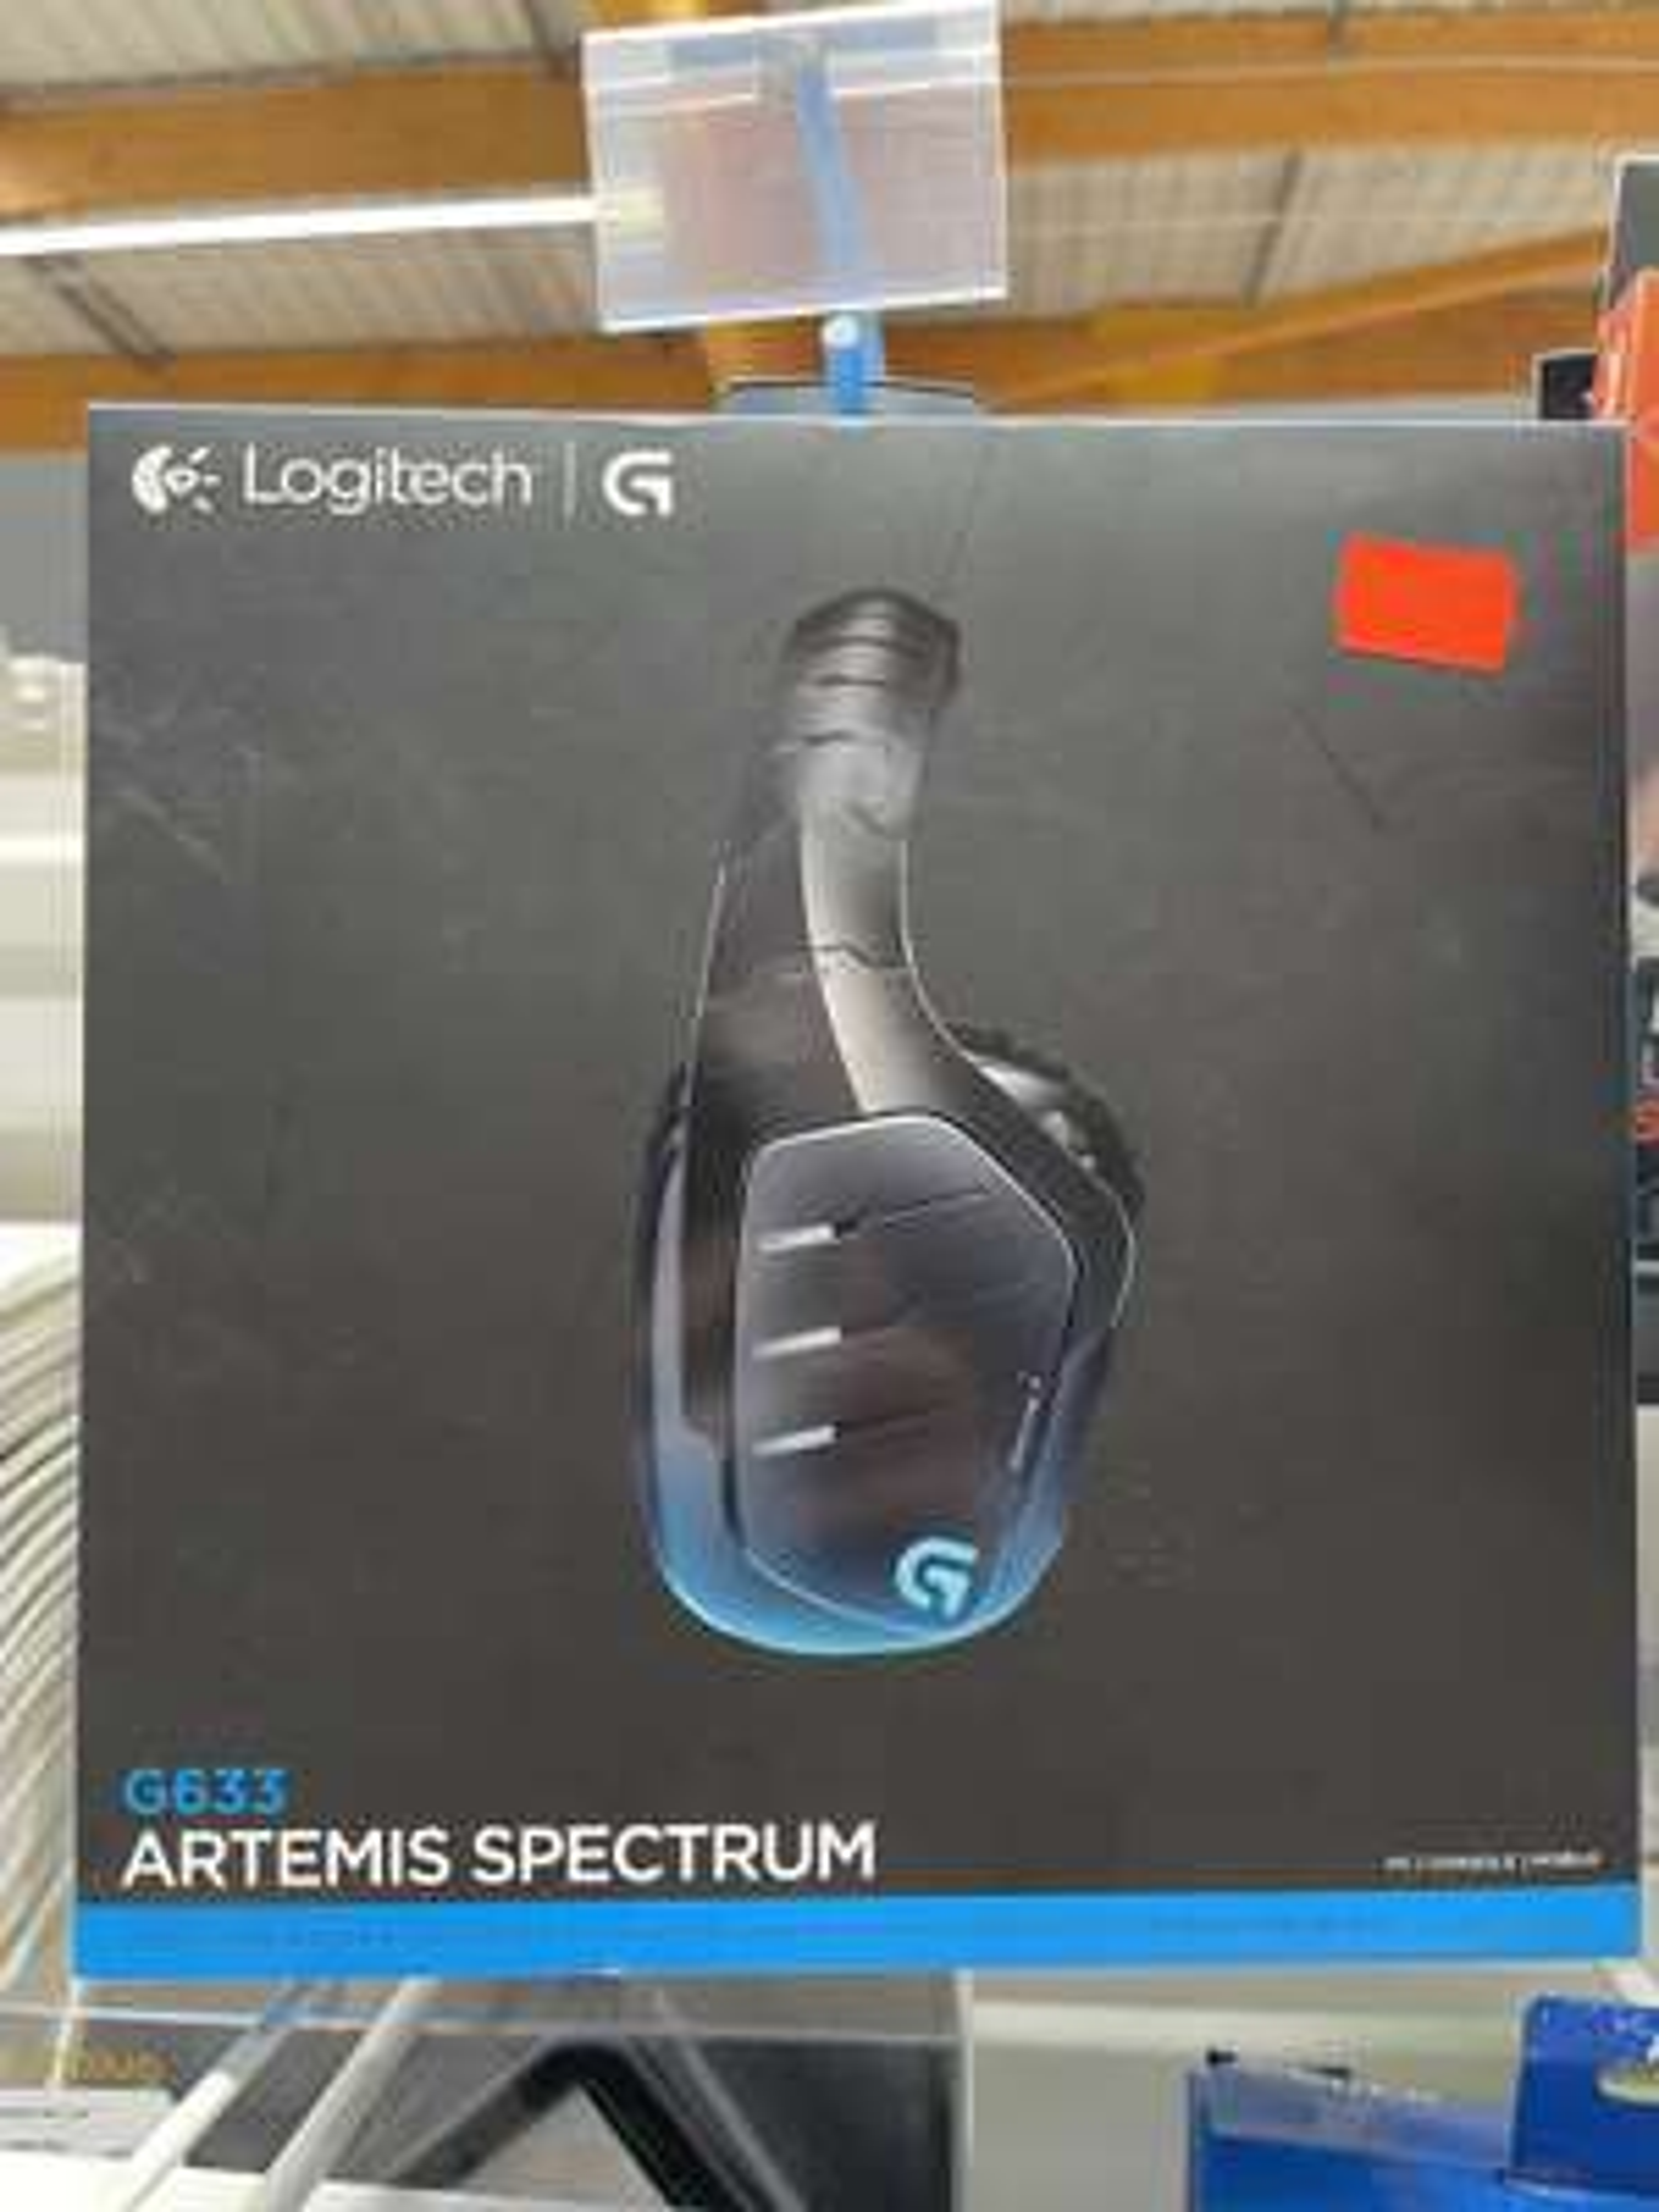 Casque Logitech G633 Artemis Spectrum - Chambéry (73)